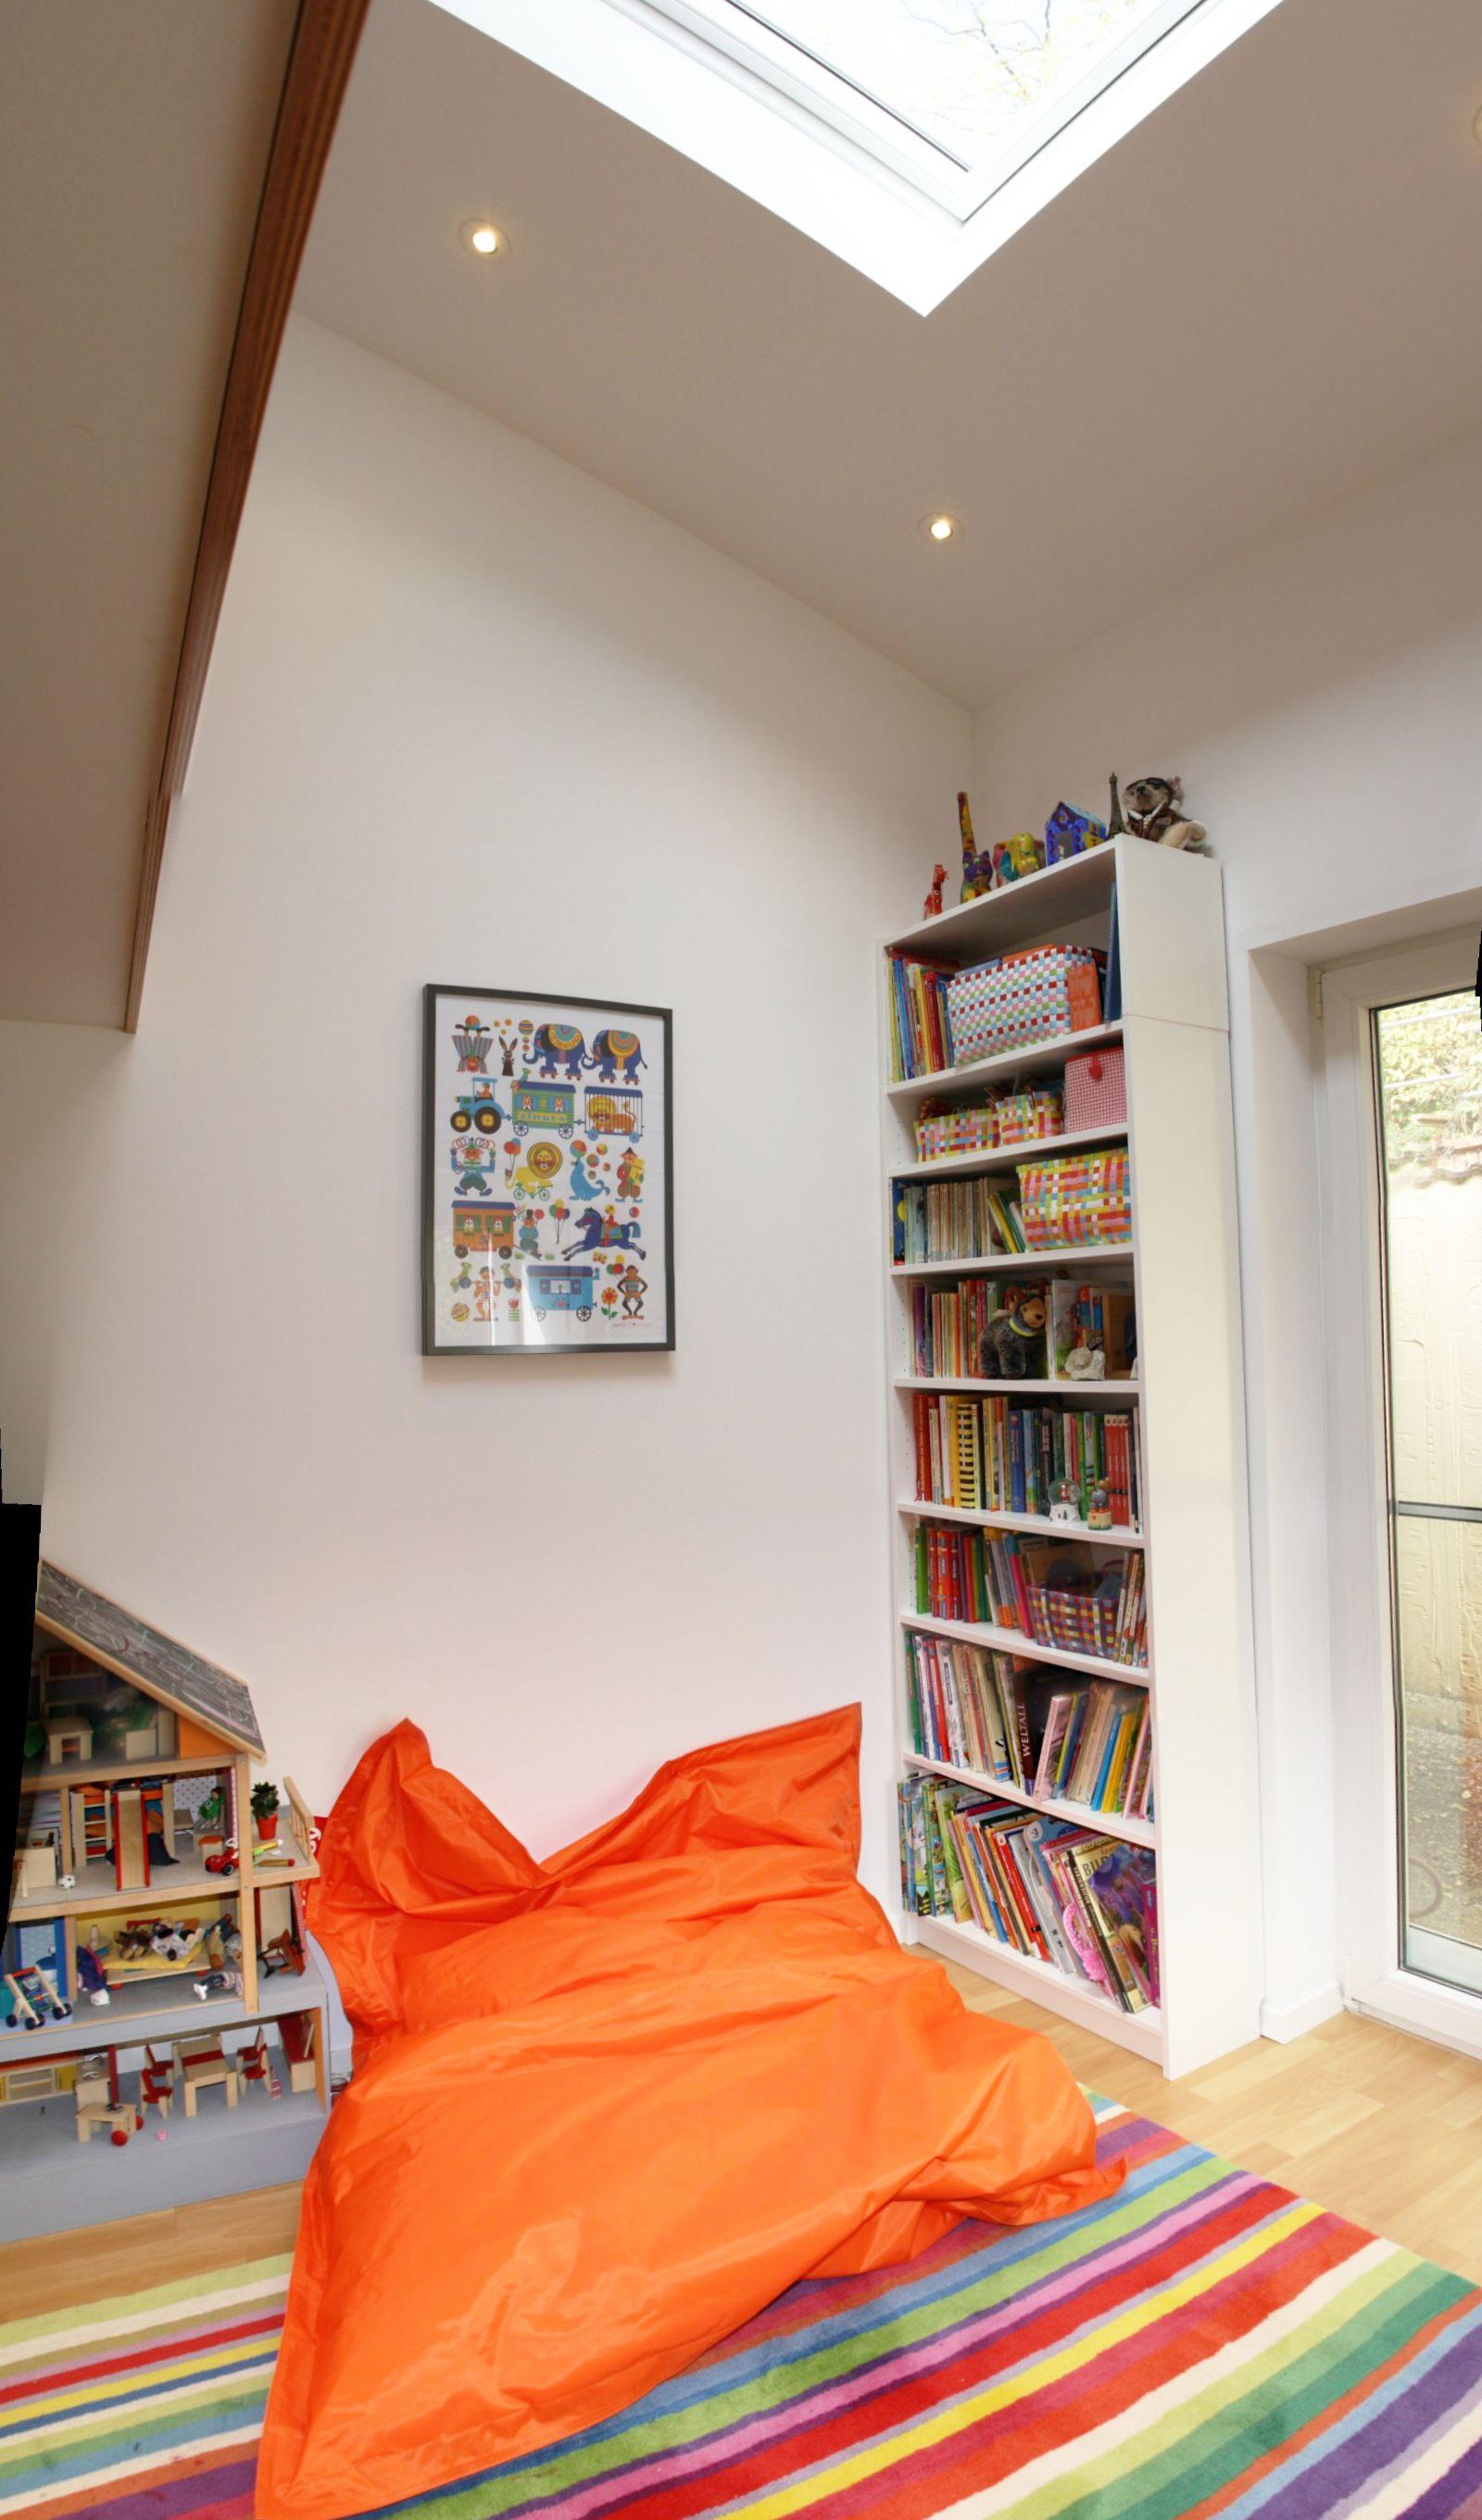 Leseecke Kinderzimmer umbau kinderzimmer einbau 2 ebene sitzsack leseecke